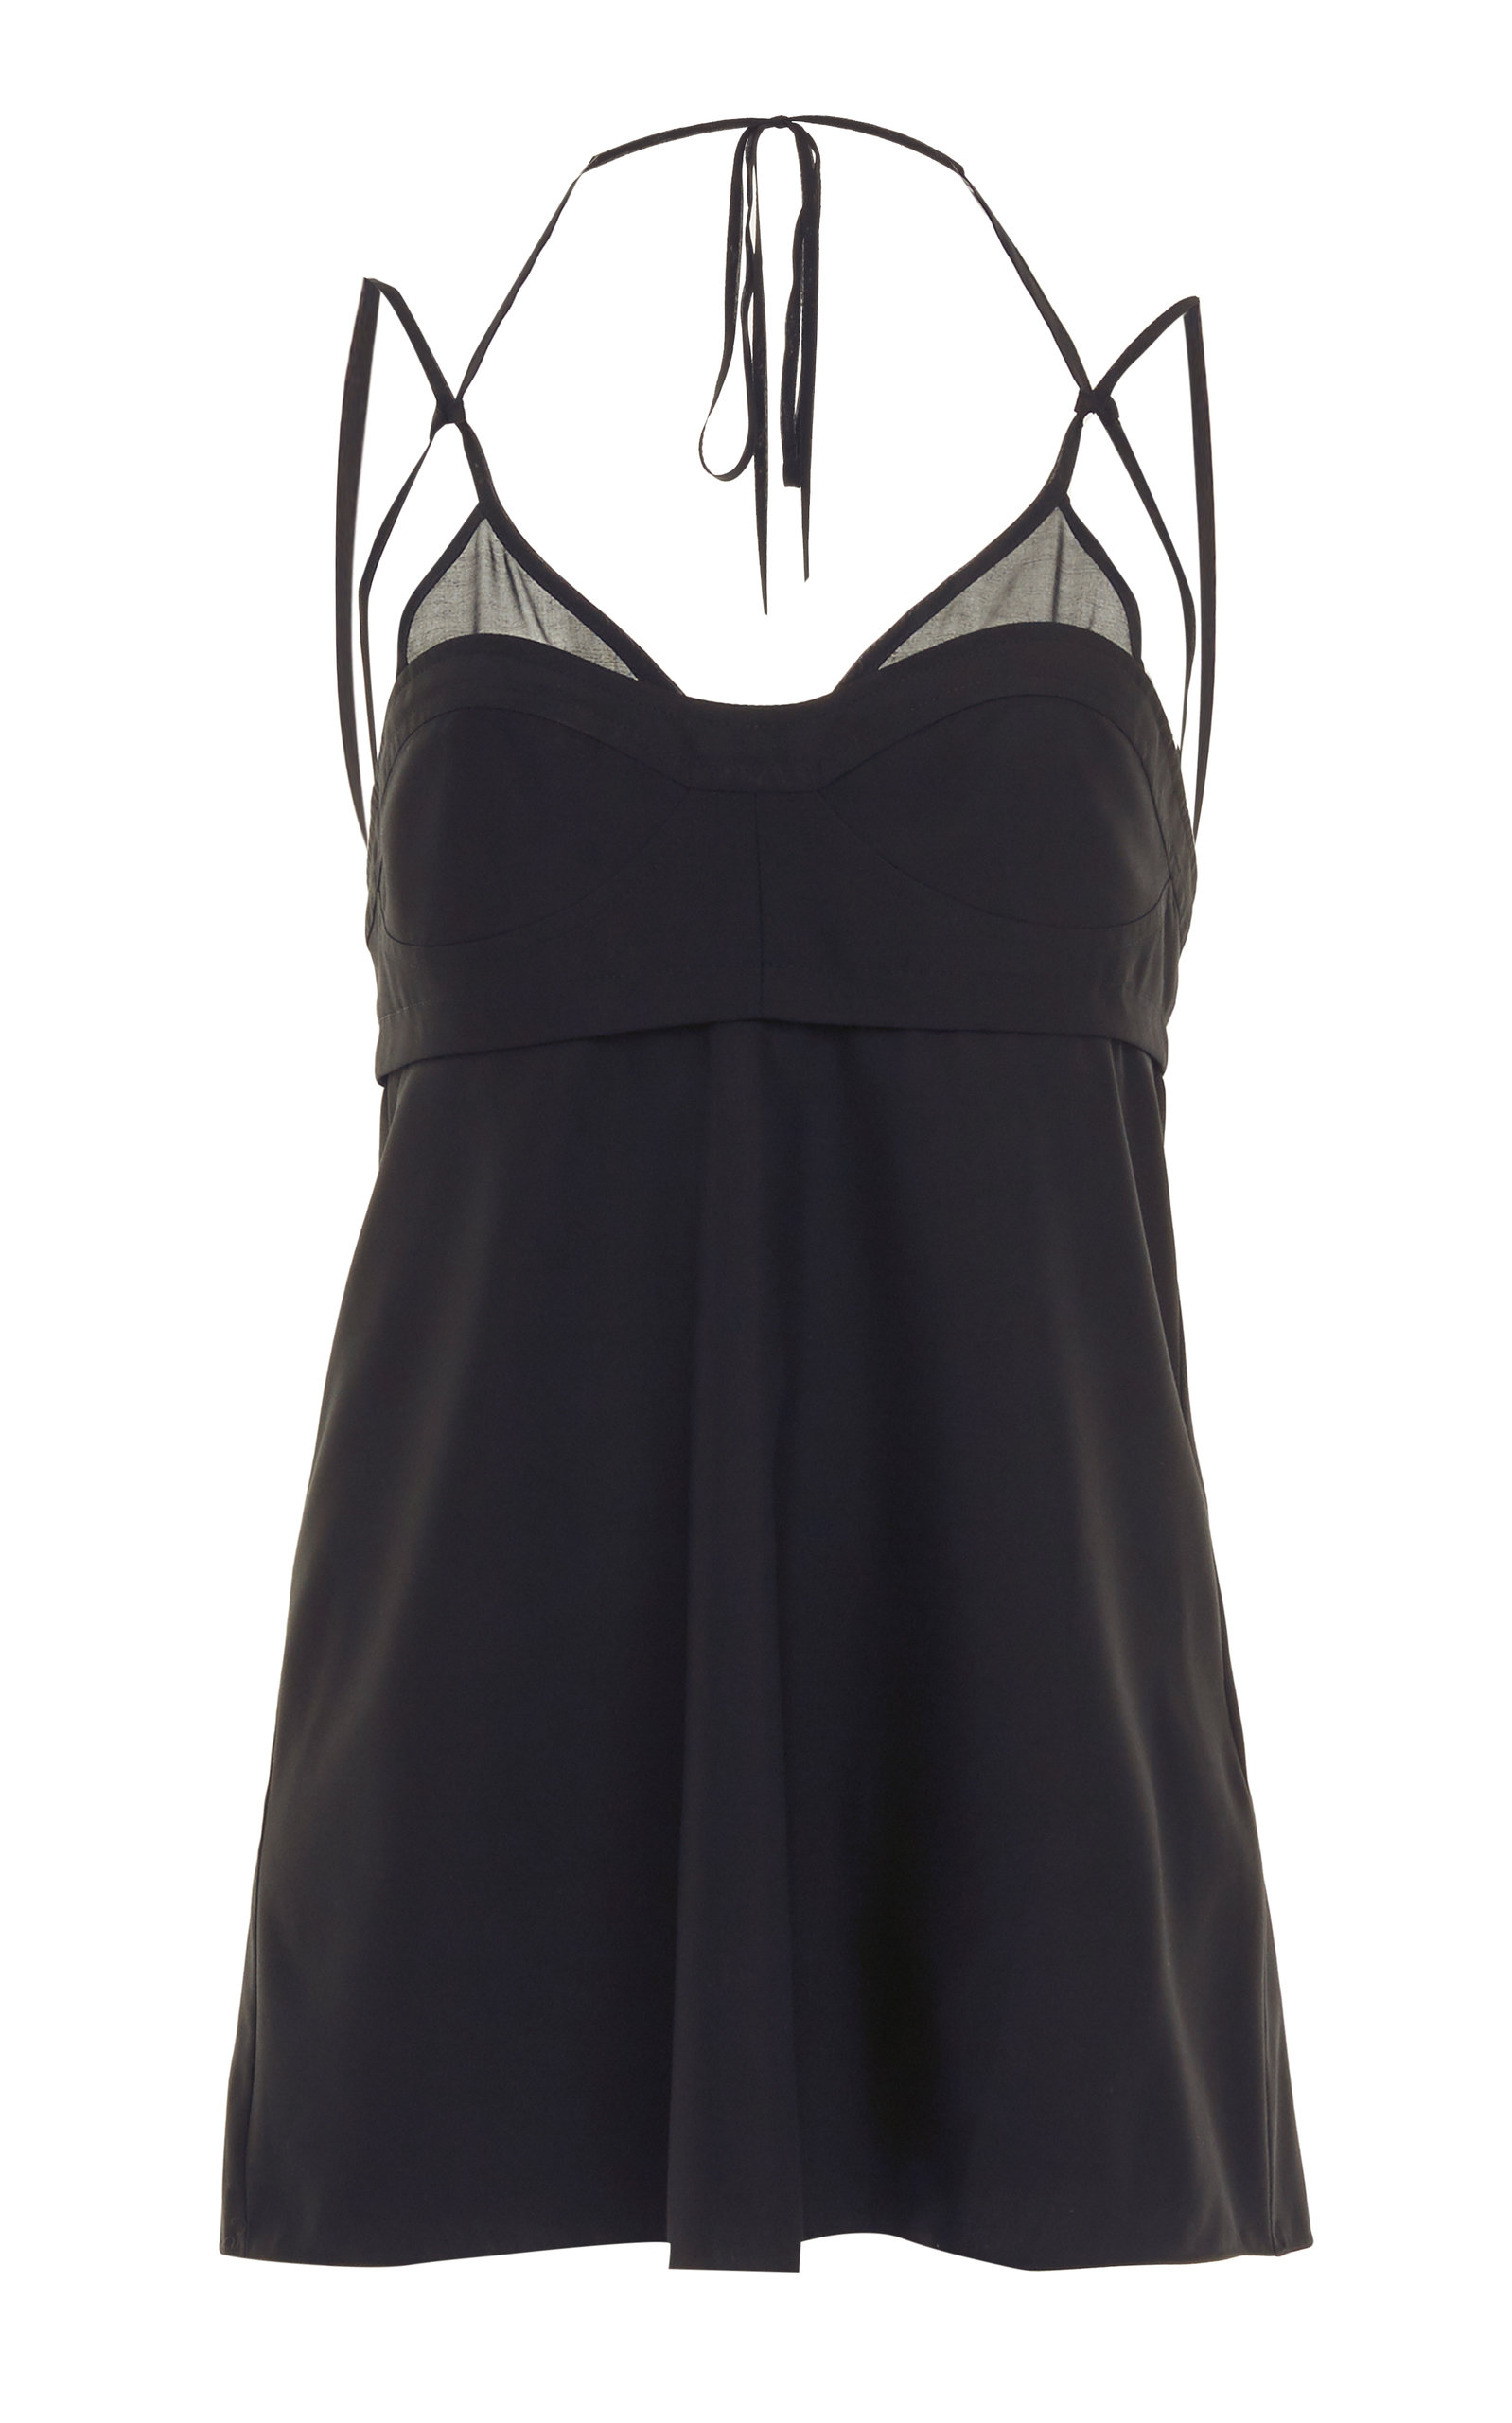 Victoria Beckham Silk Poplin Layered Bra Cami Top In Black